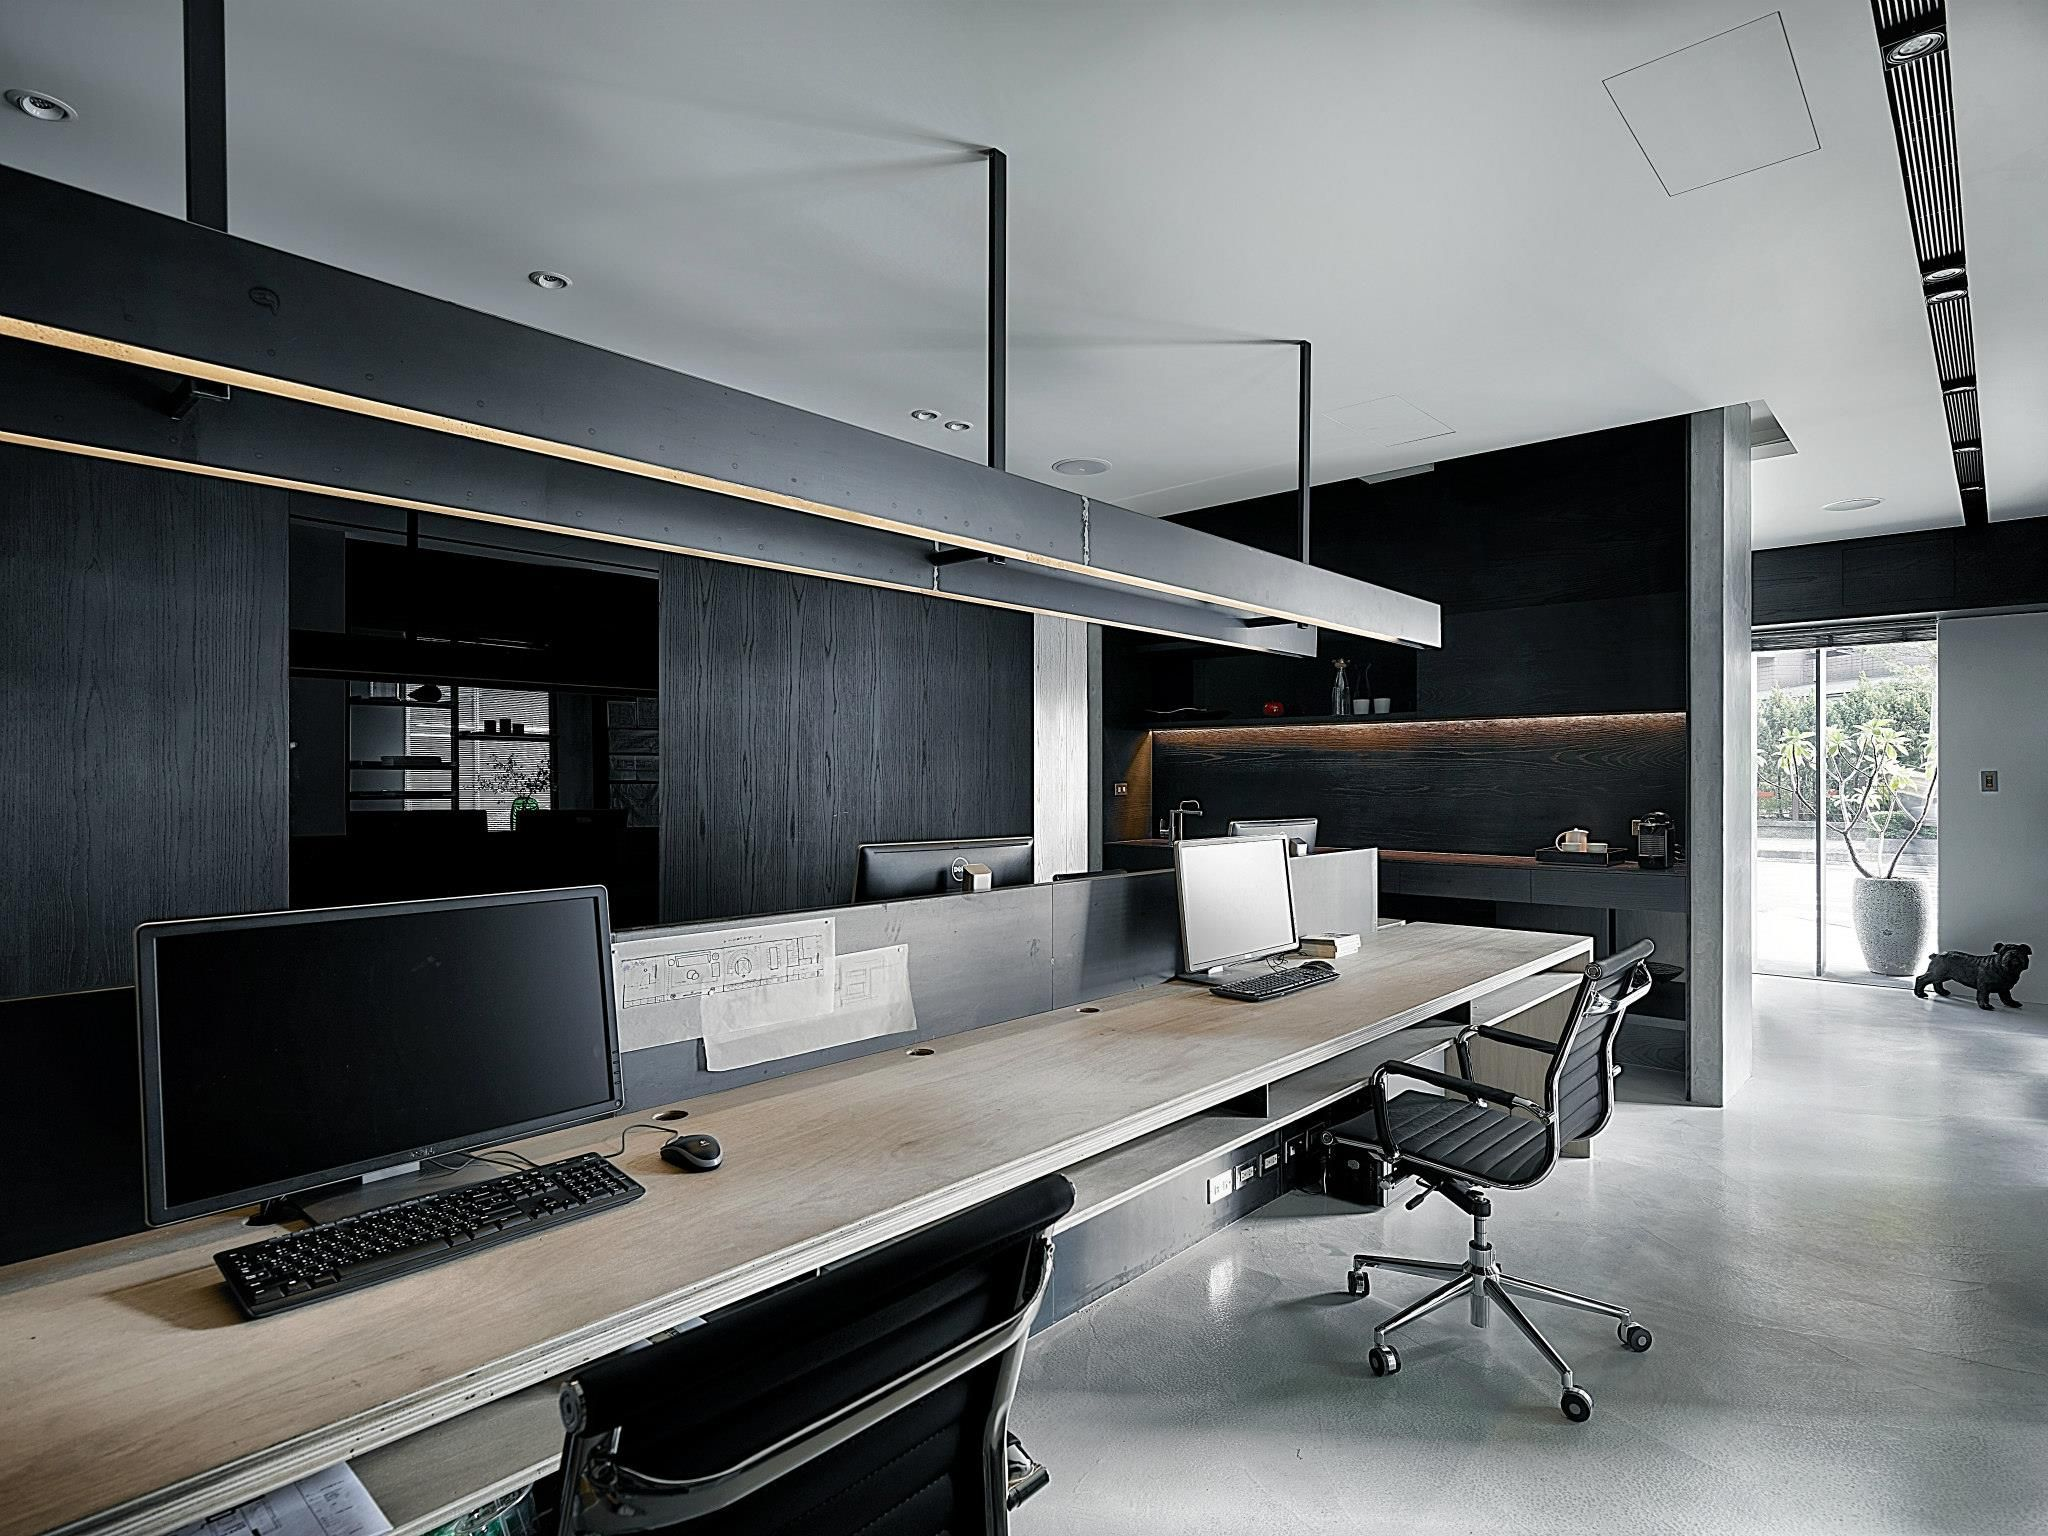 Wandfarbe Arbeitszimmer ~ Onework design taipei office 工一設計台北辦公室 office design